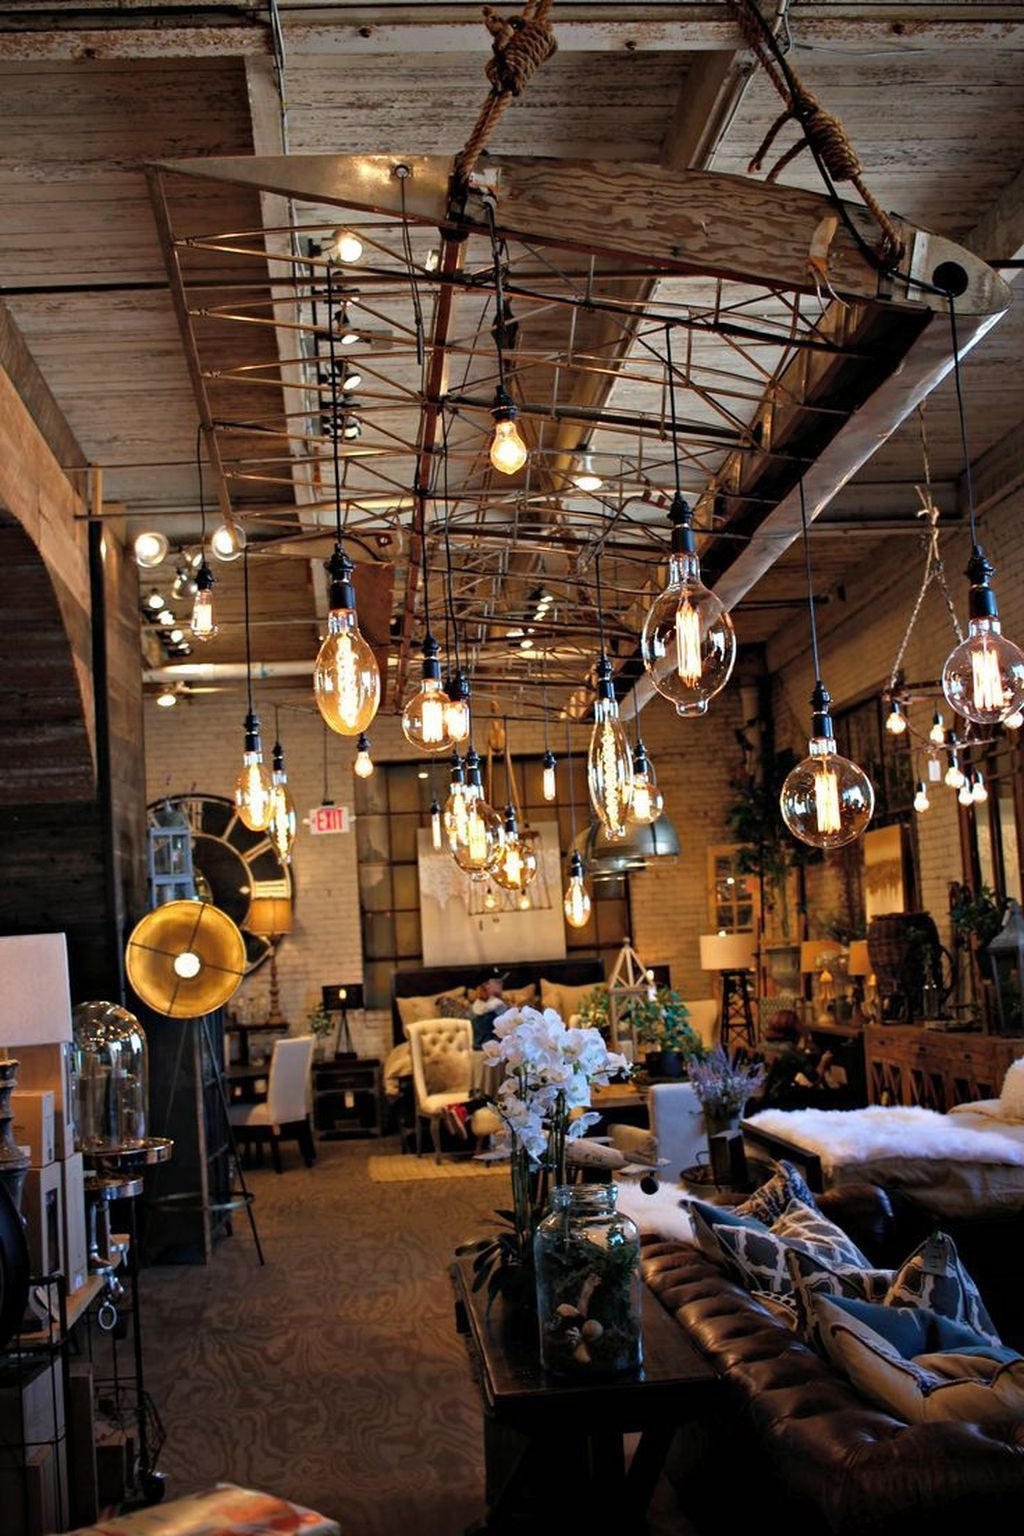 35 Amazing Interiors Urban Farmhouse Design Ideas For You ...